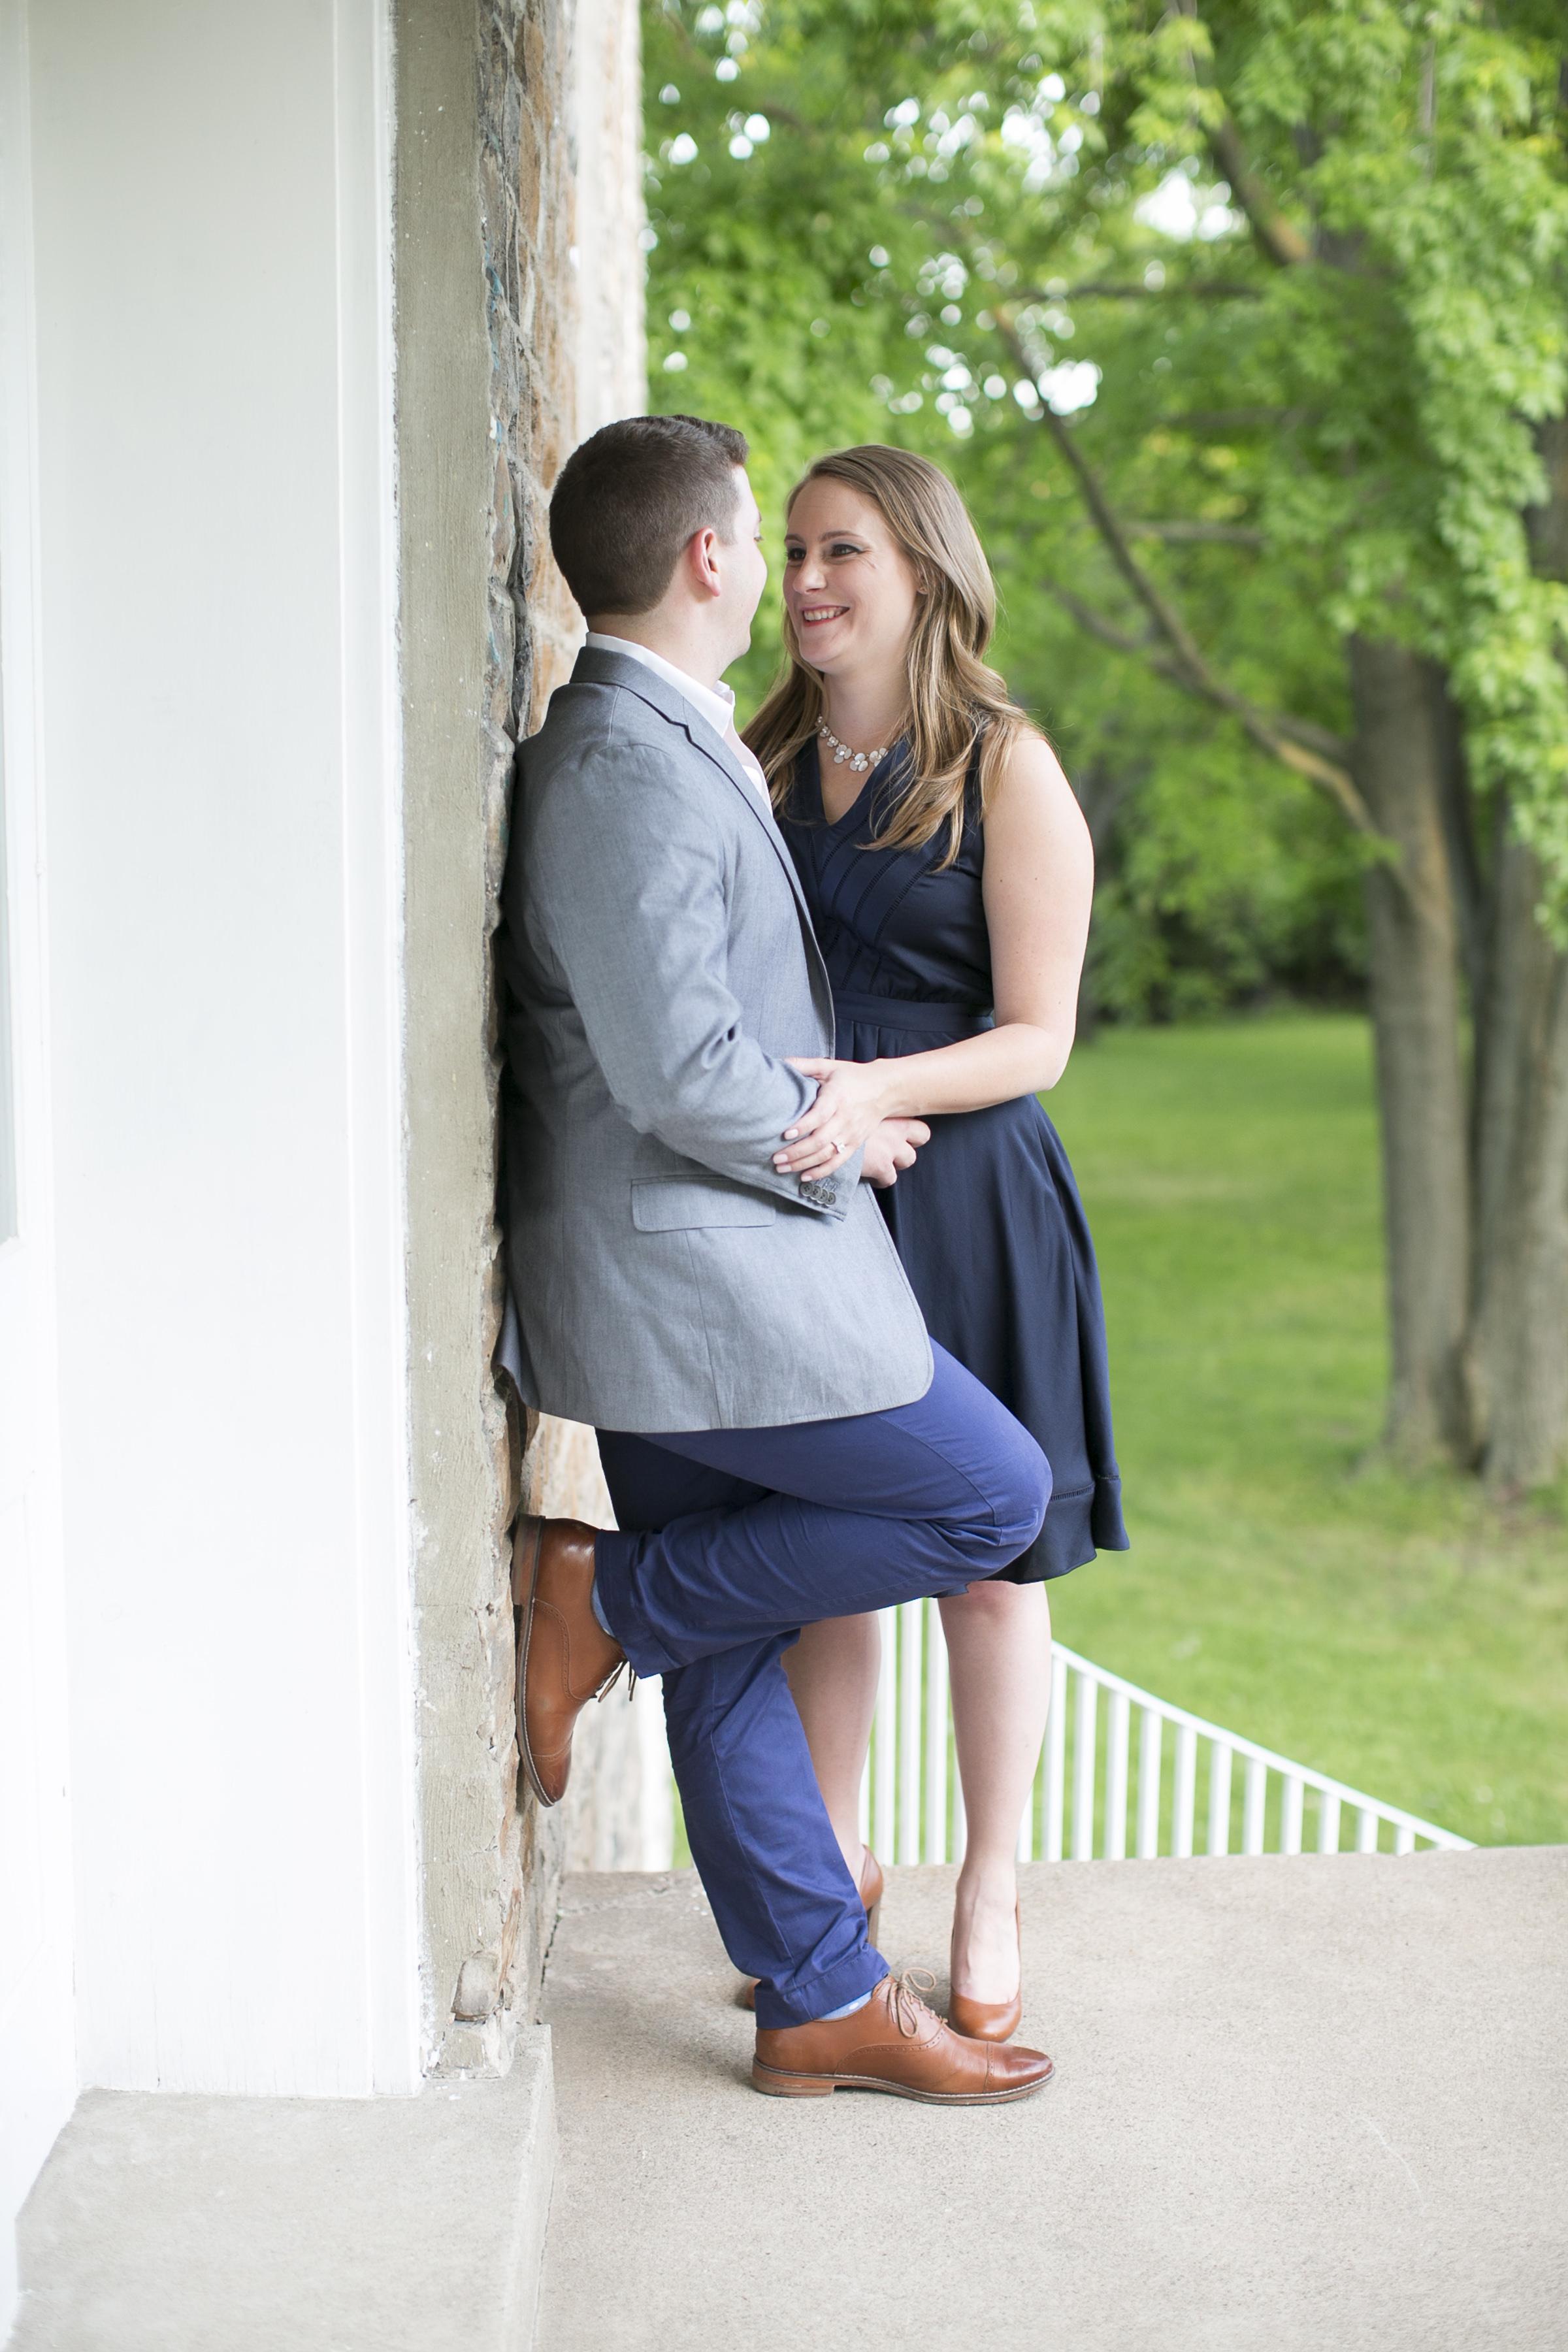 Niagara-on-the-Lake-Summer-Engagement-photos-by-Philosophy-Studios007.JPG